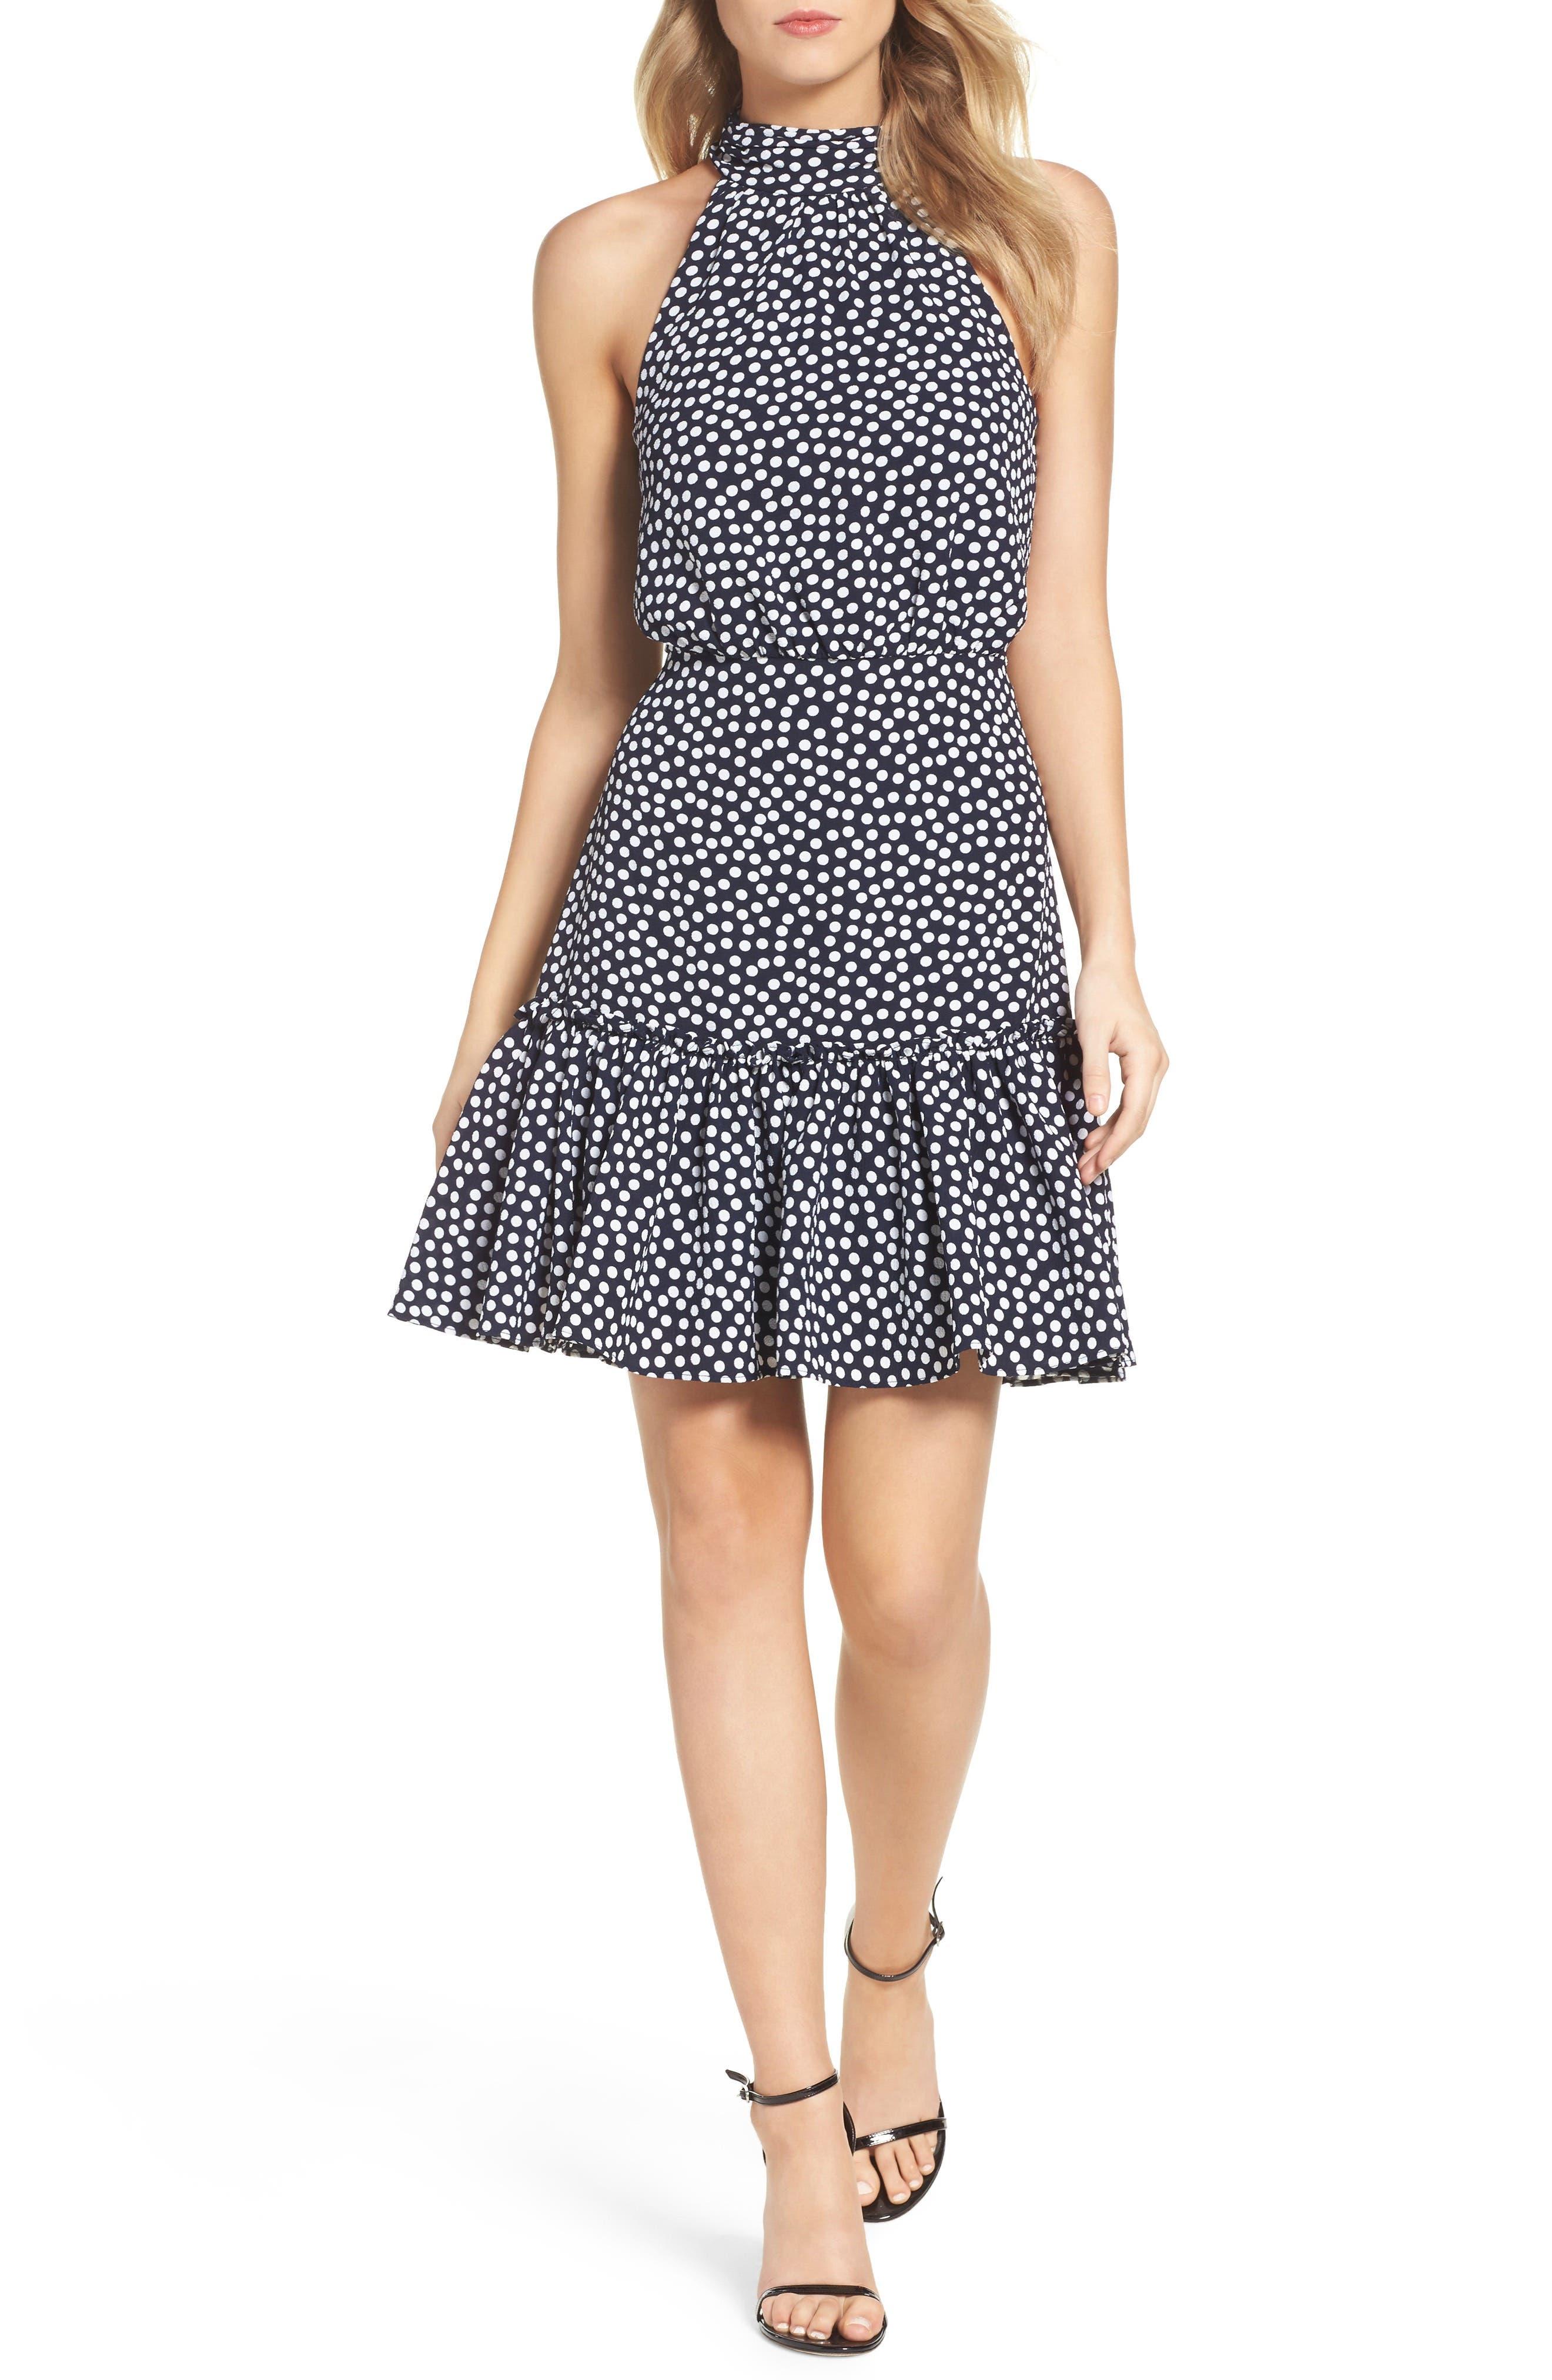 Betsey Johnson Halter Dress